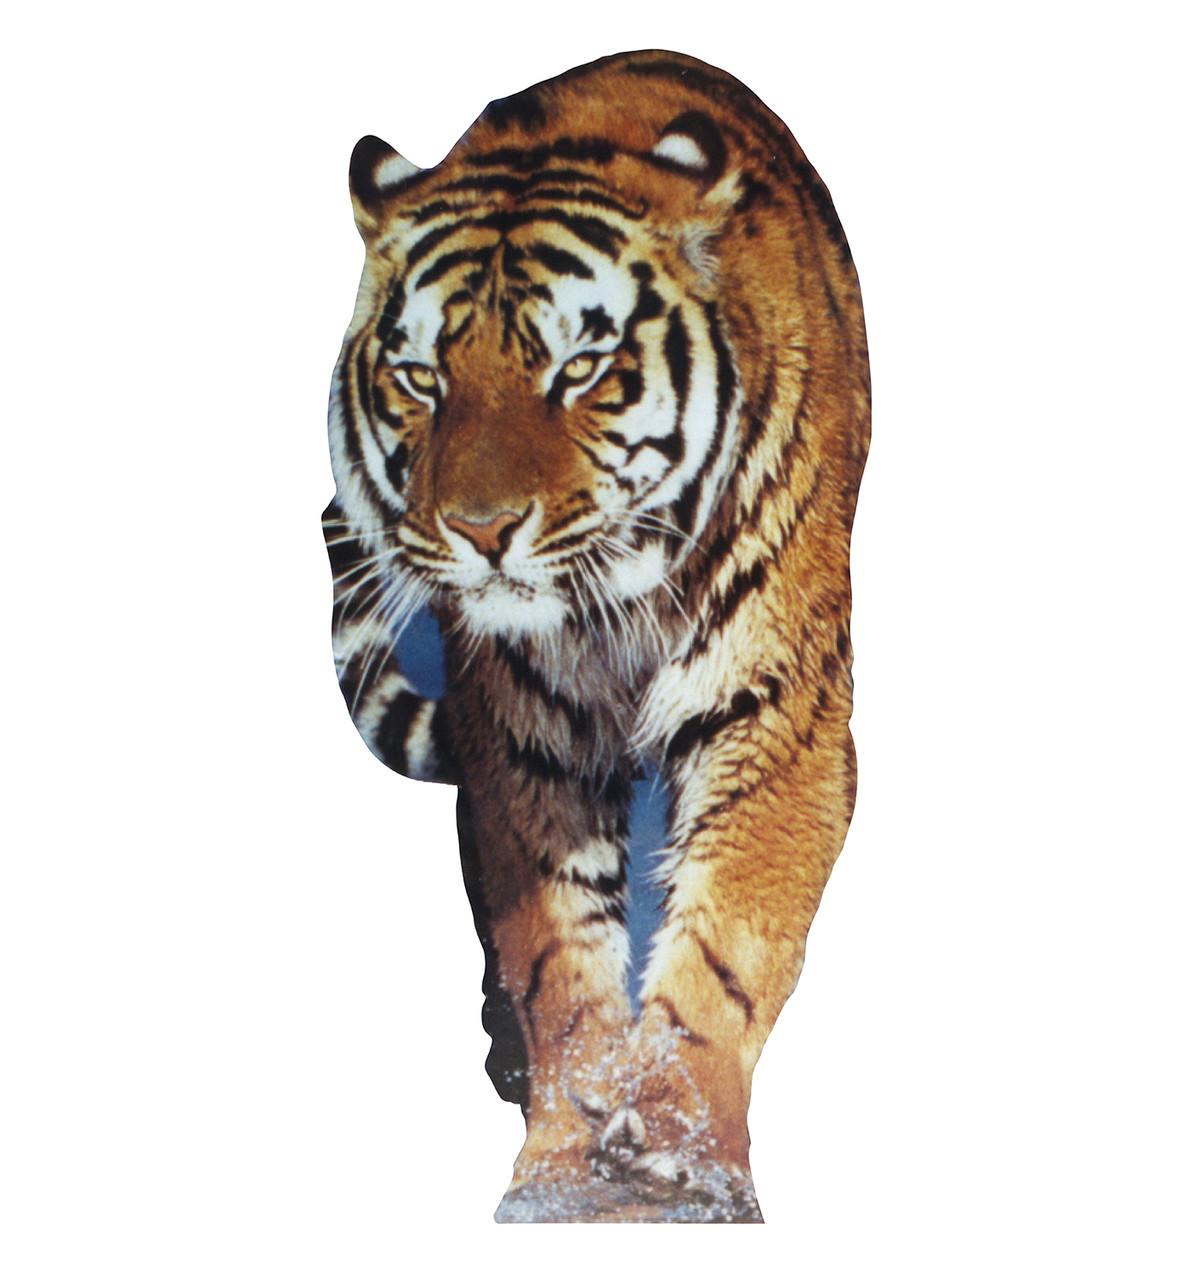 Life-size Tiger Cardboard Standup